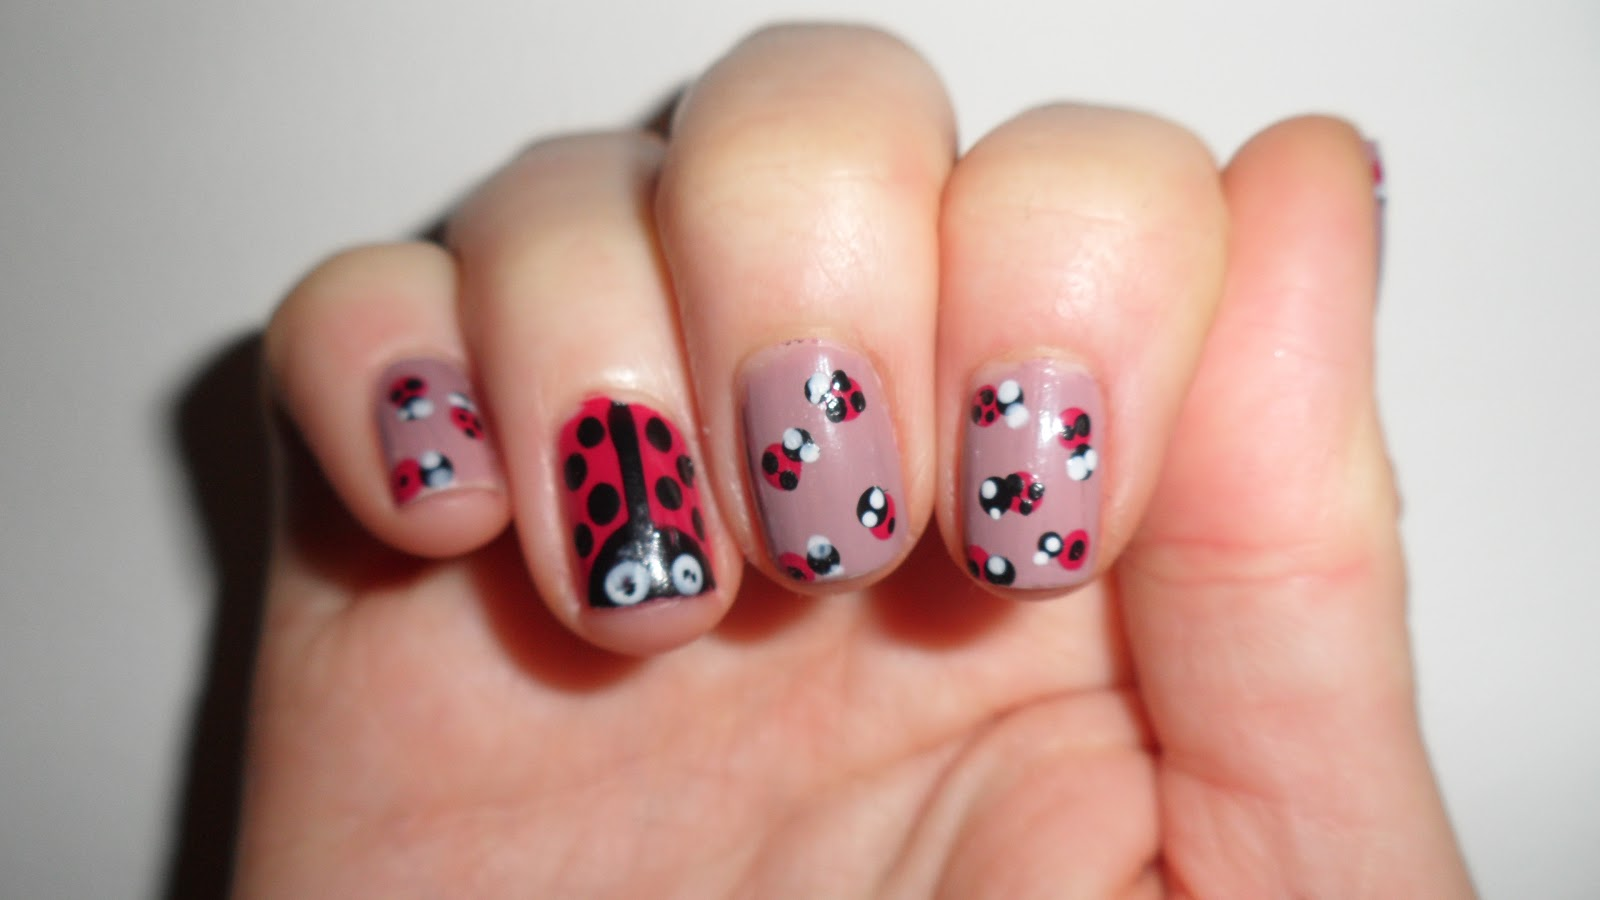 Ladybug Nail Art | www.imgkid.com - The Image Kid Has It!